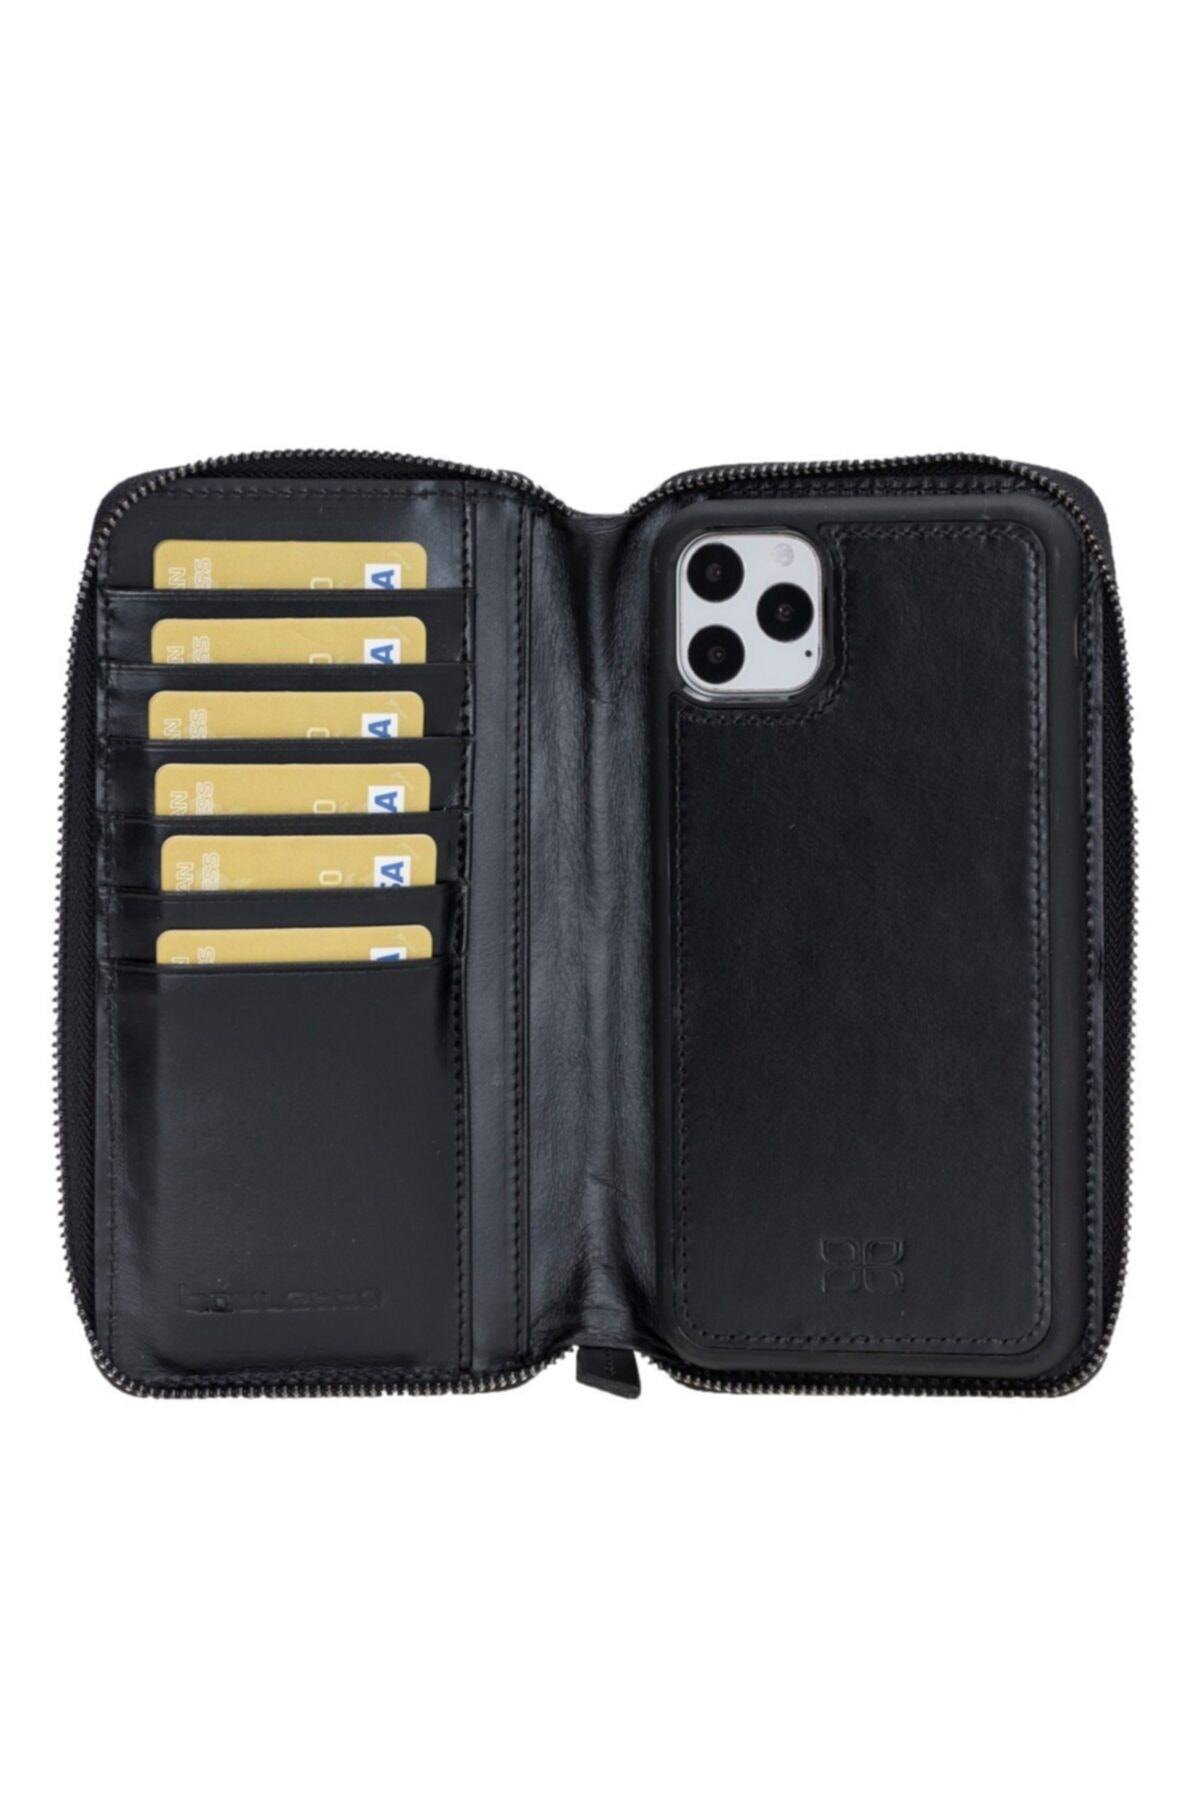 Bouletta Mw Pouch Deri Telefon Kılıfı Iphone 11 Promax Rst1 Siyah Rfıd 2